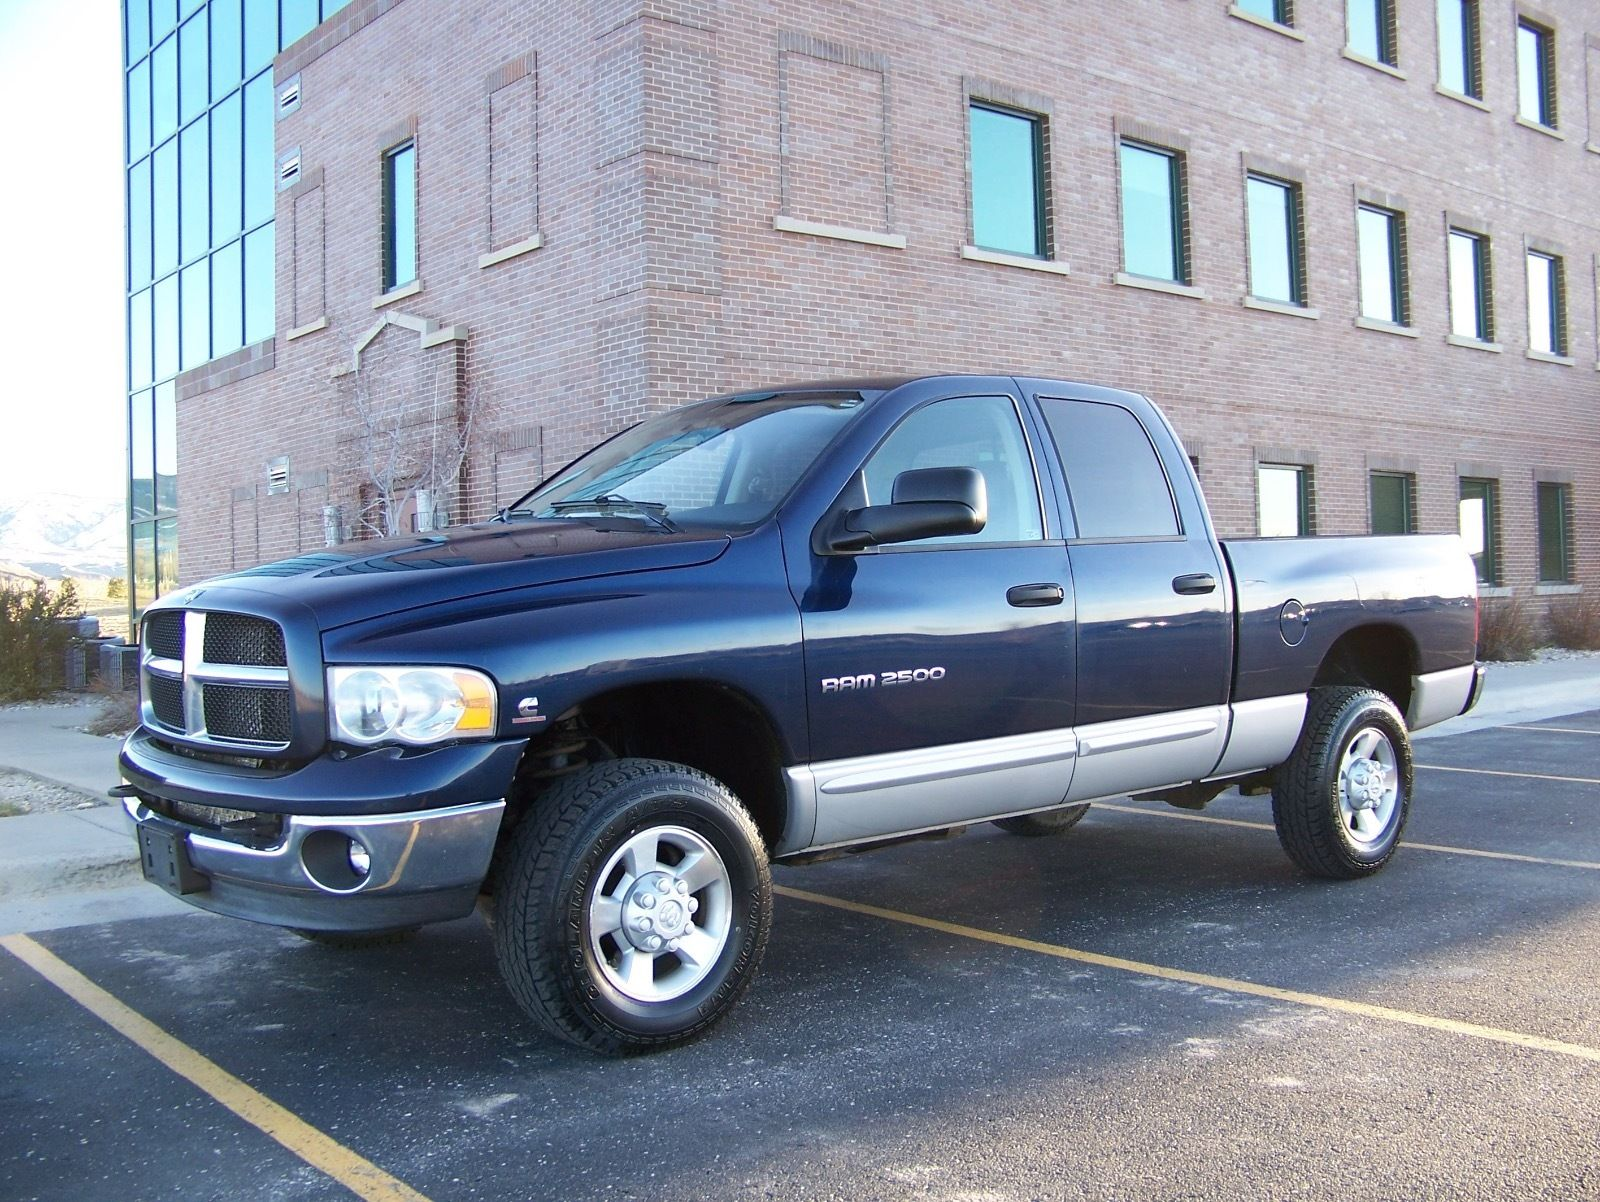 Jonesgruel Dodge Mega Cab Diesel For Sale Near Me